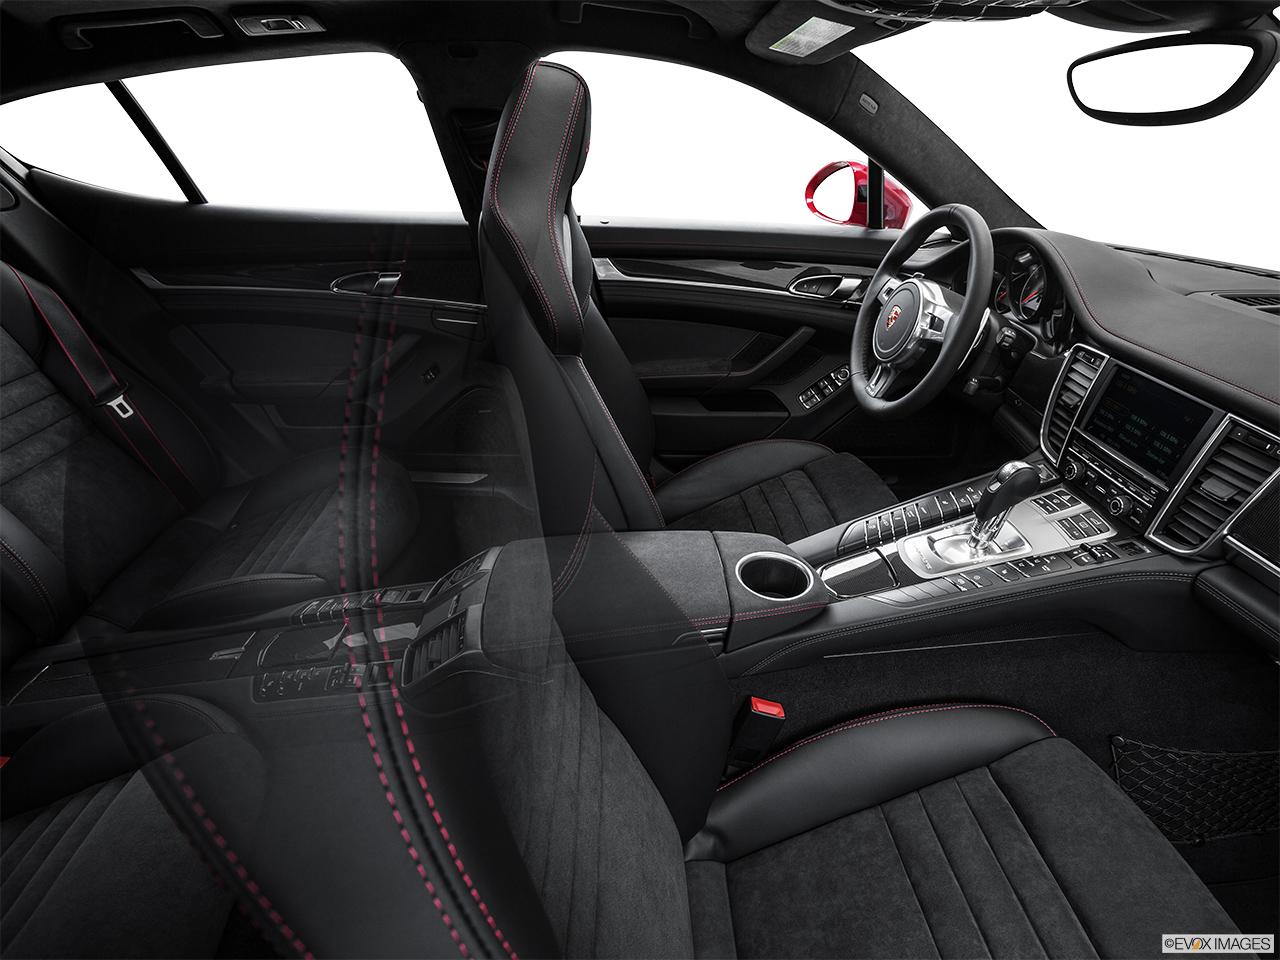 2015 porsche panamera turbo hatchback fake buck shot interior from passenger b pillar